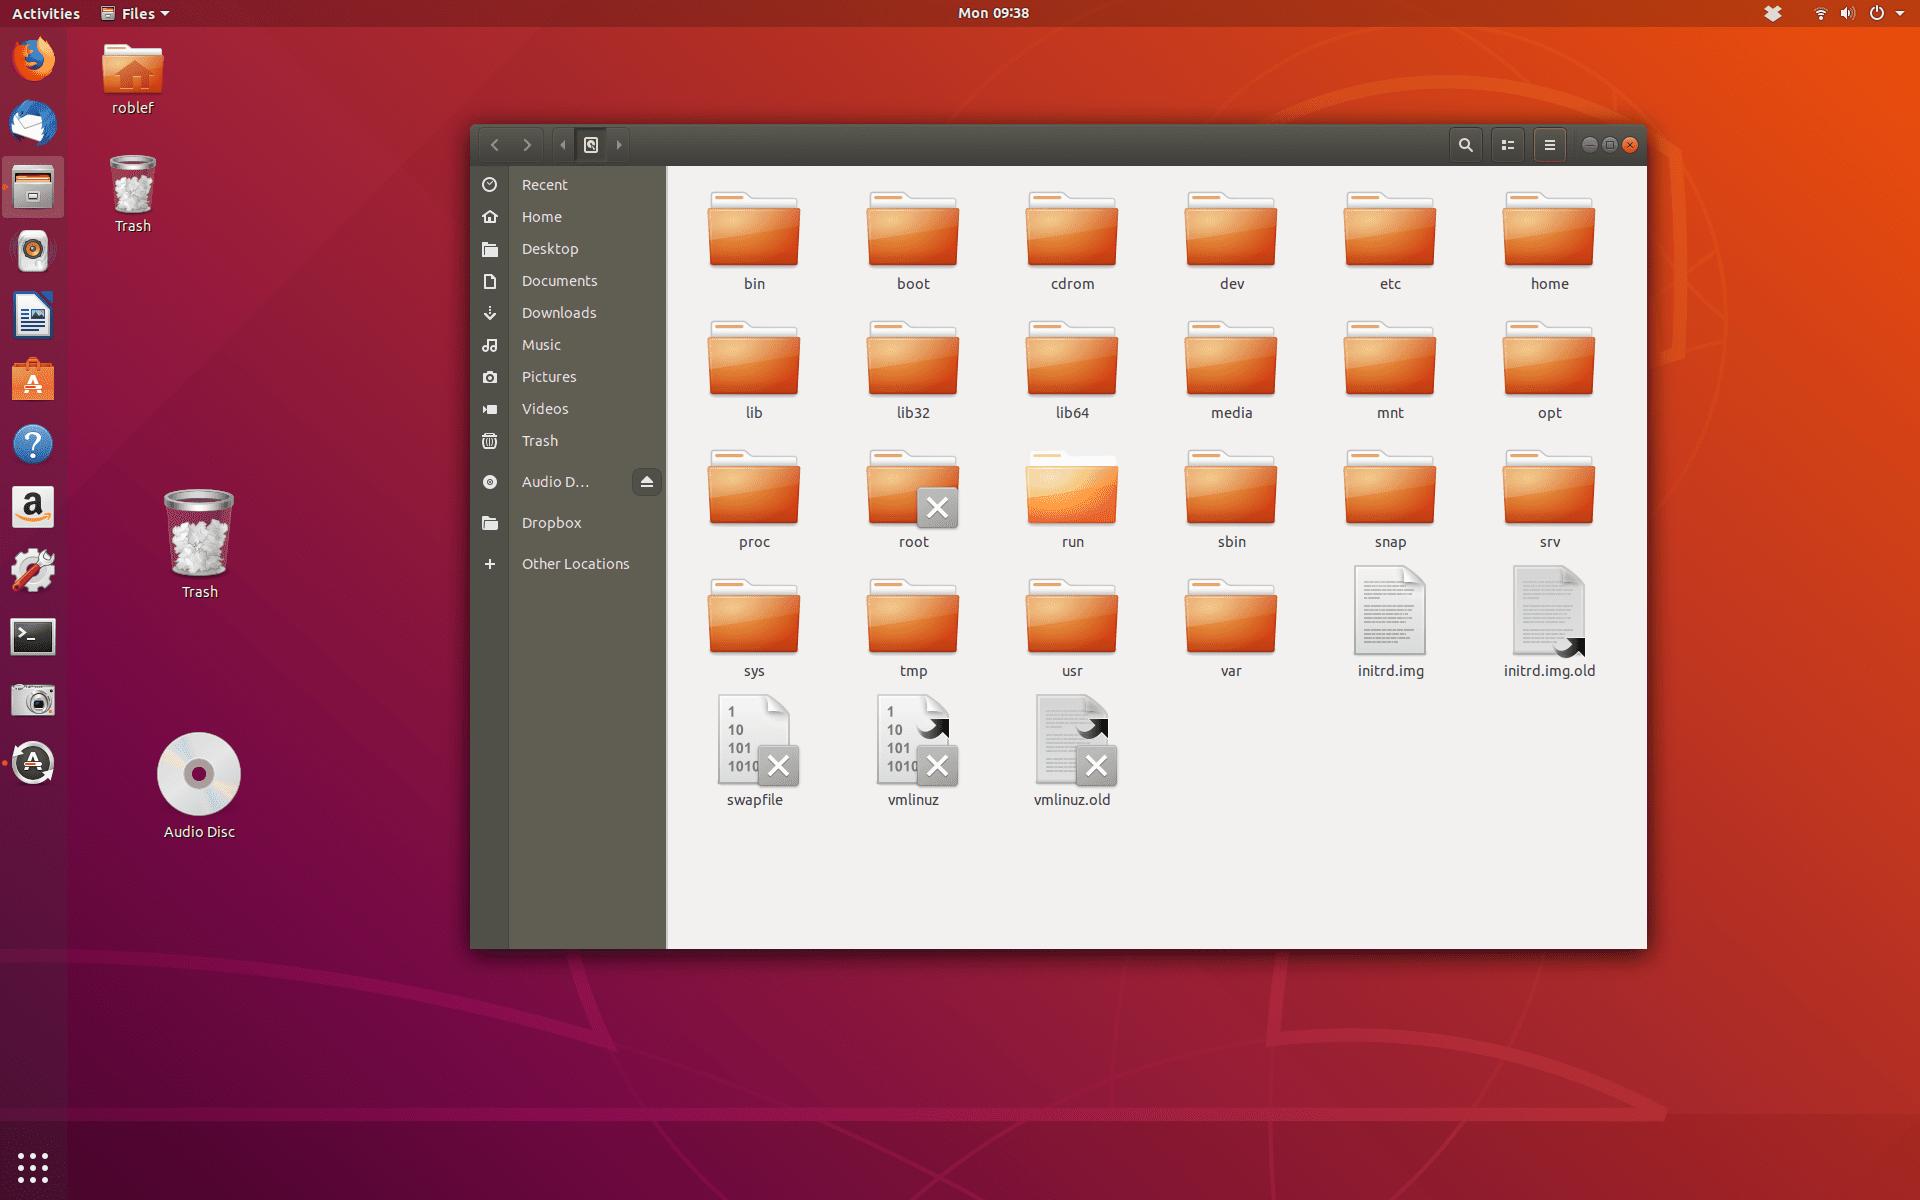 Root directory on Ubuntu Linux desktop